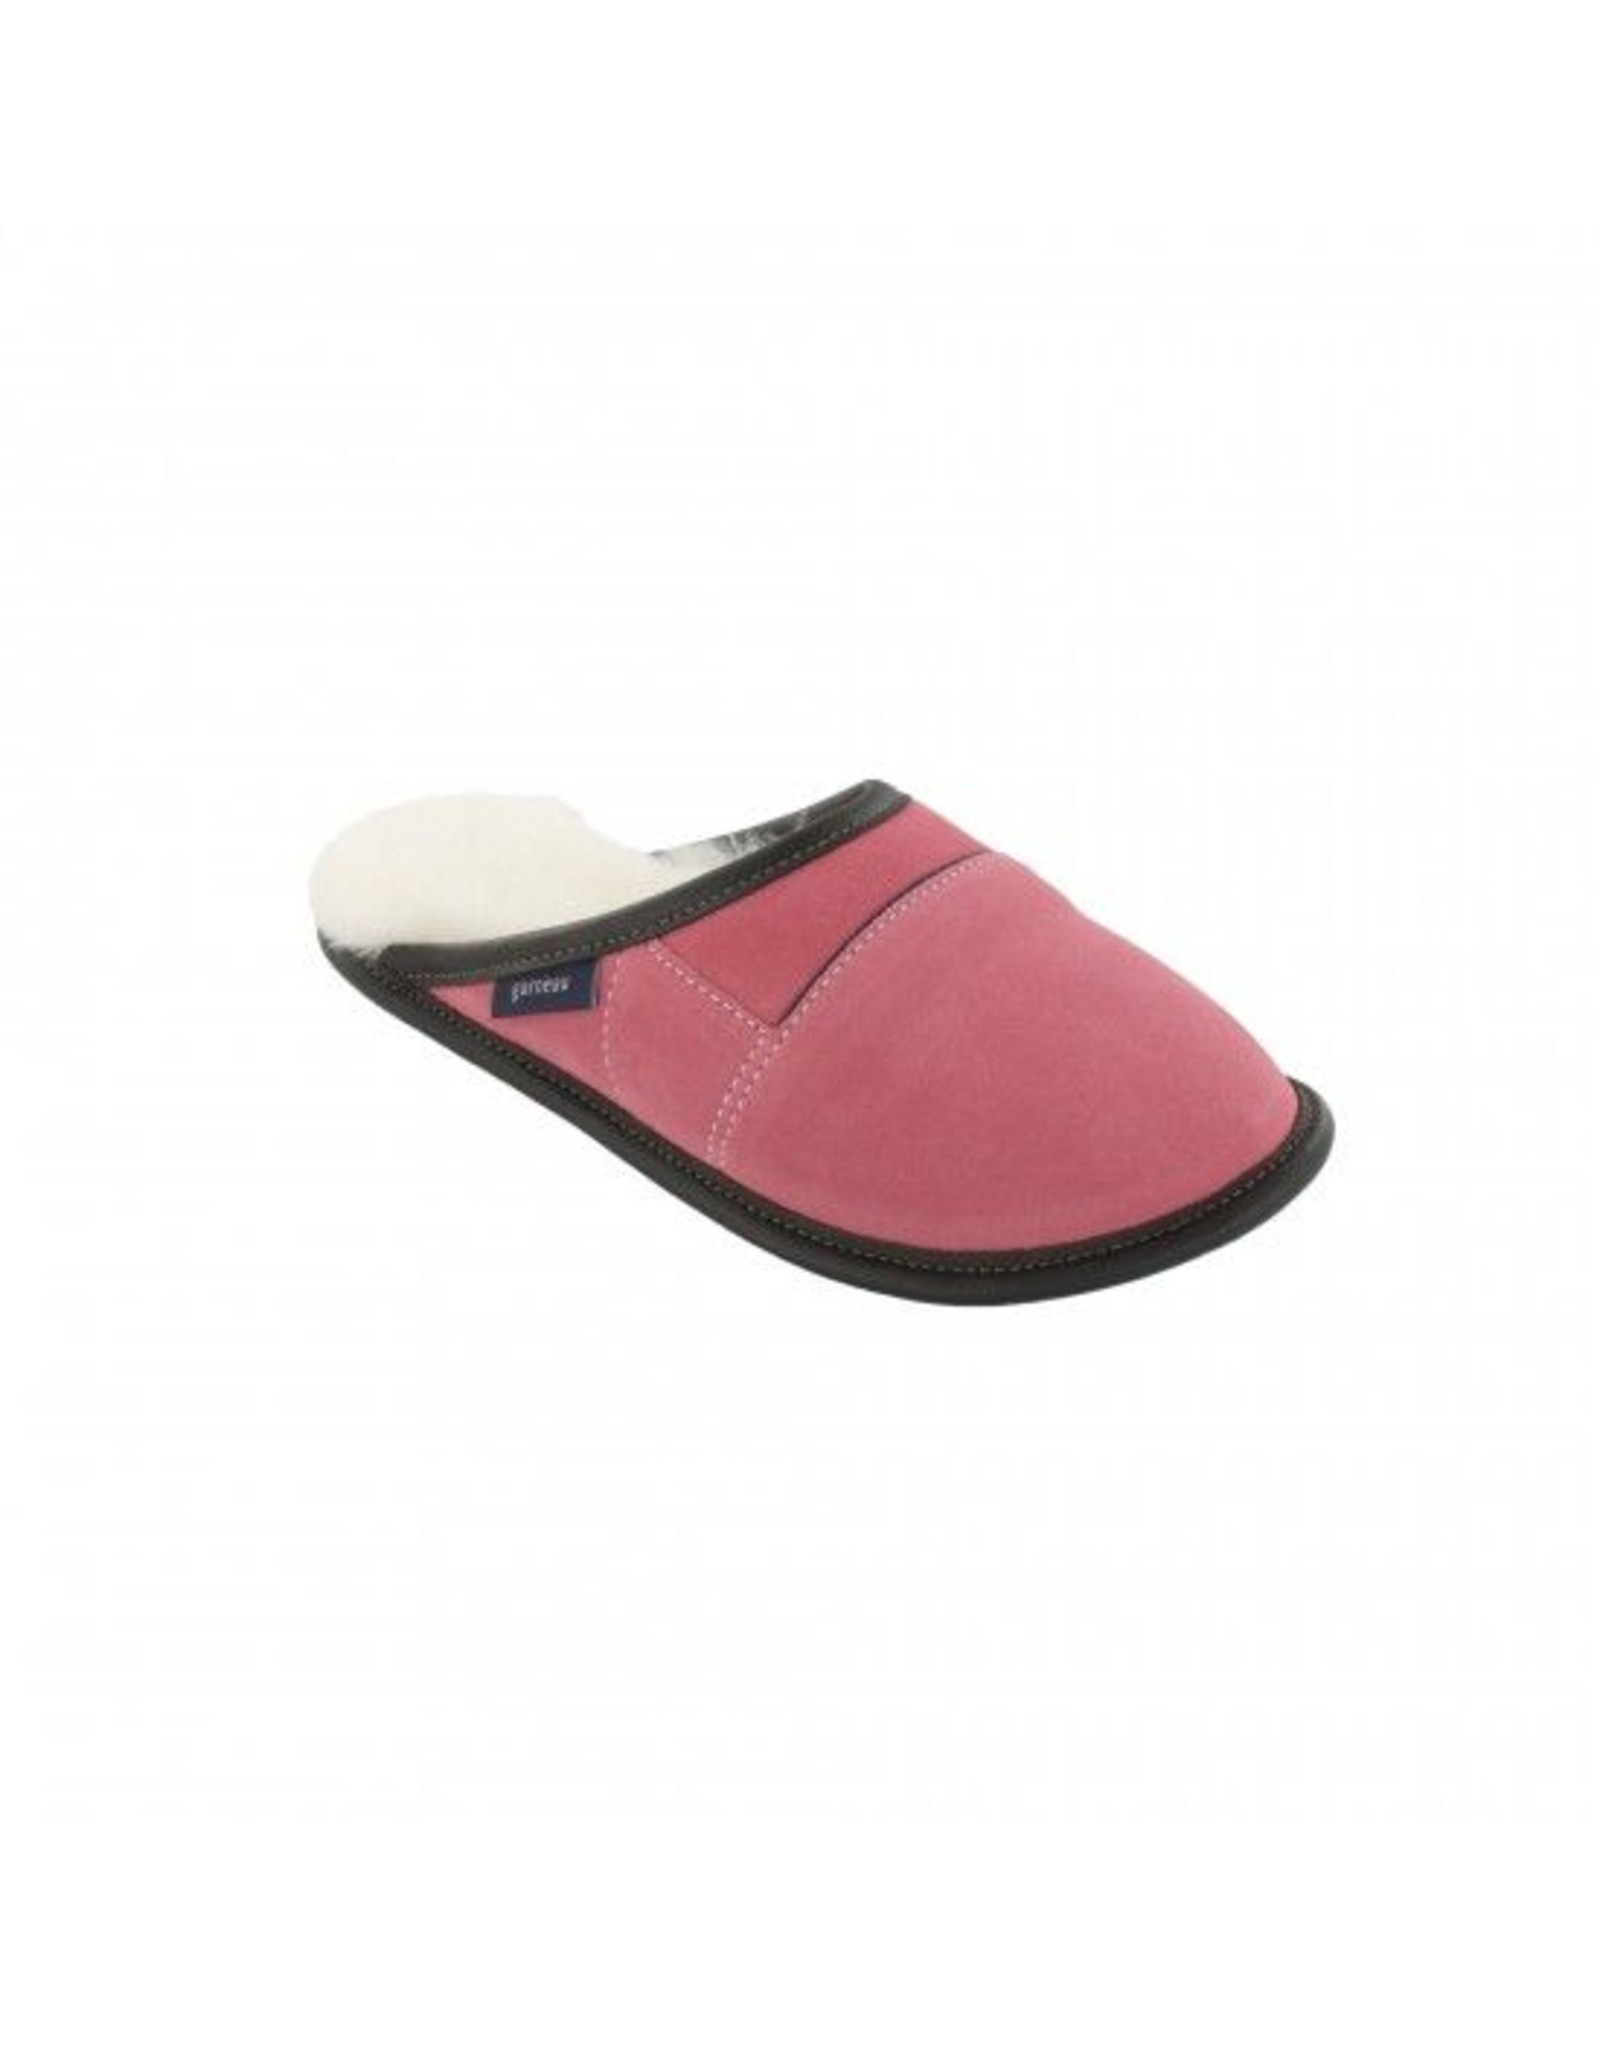 Garneau Women's Ladies Suede Slip On - More Colours Available